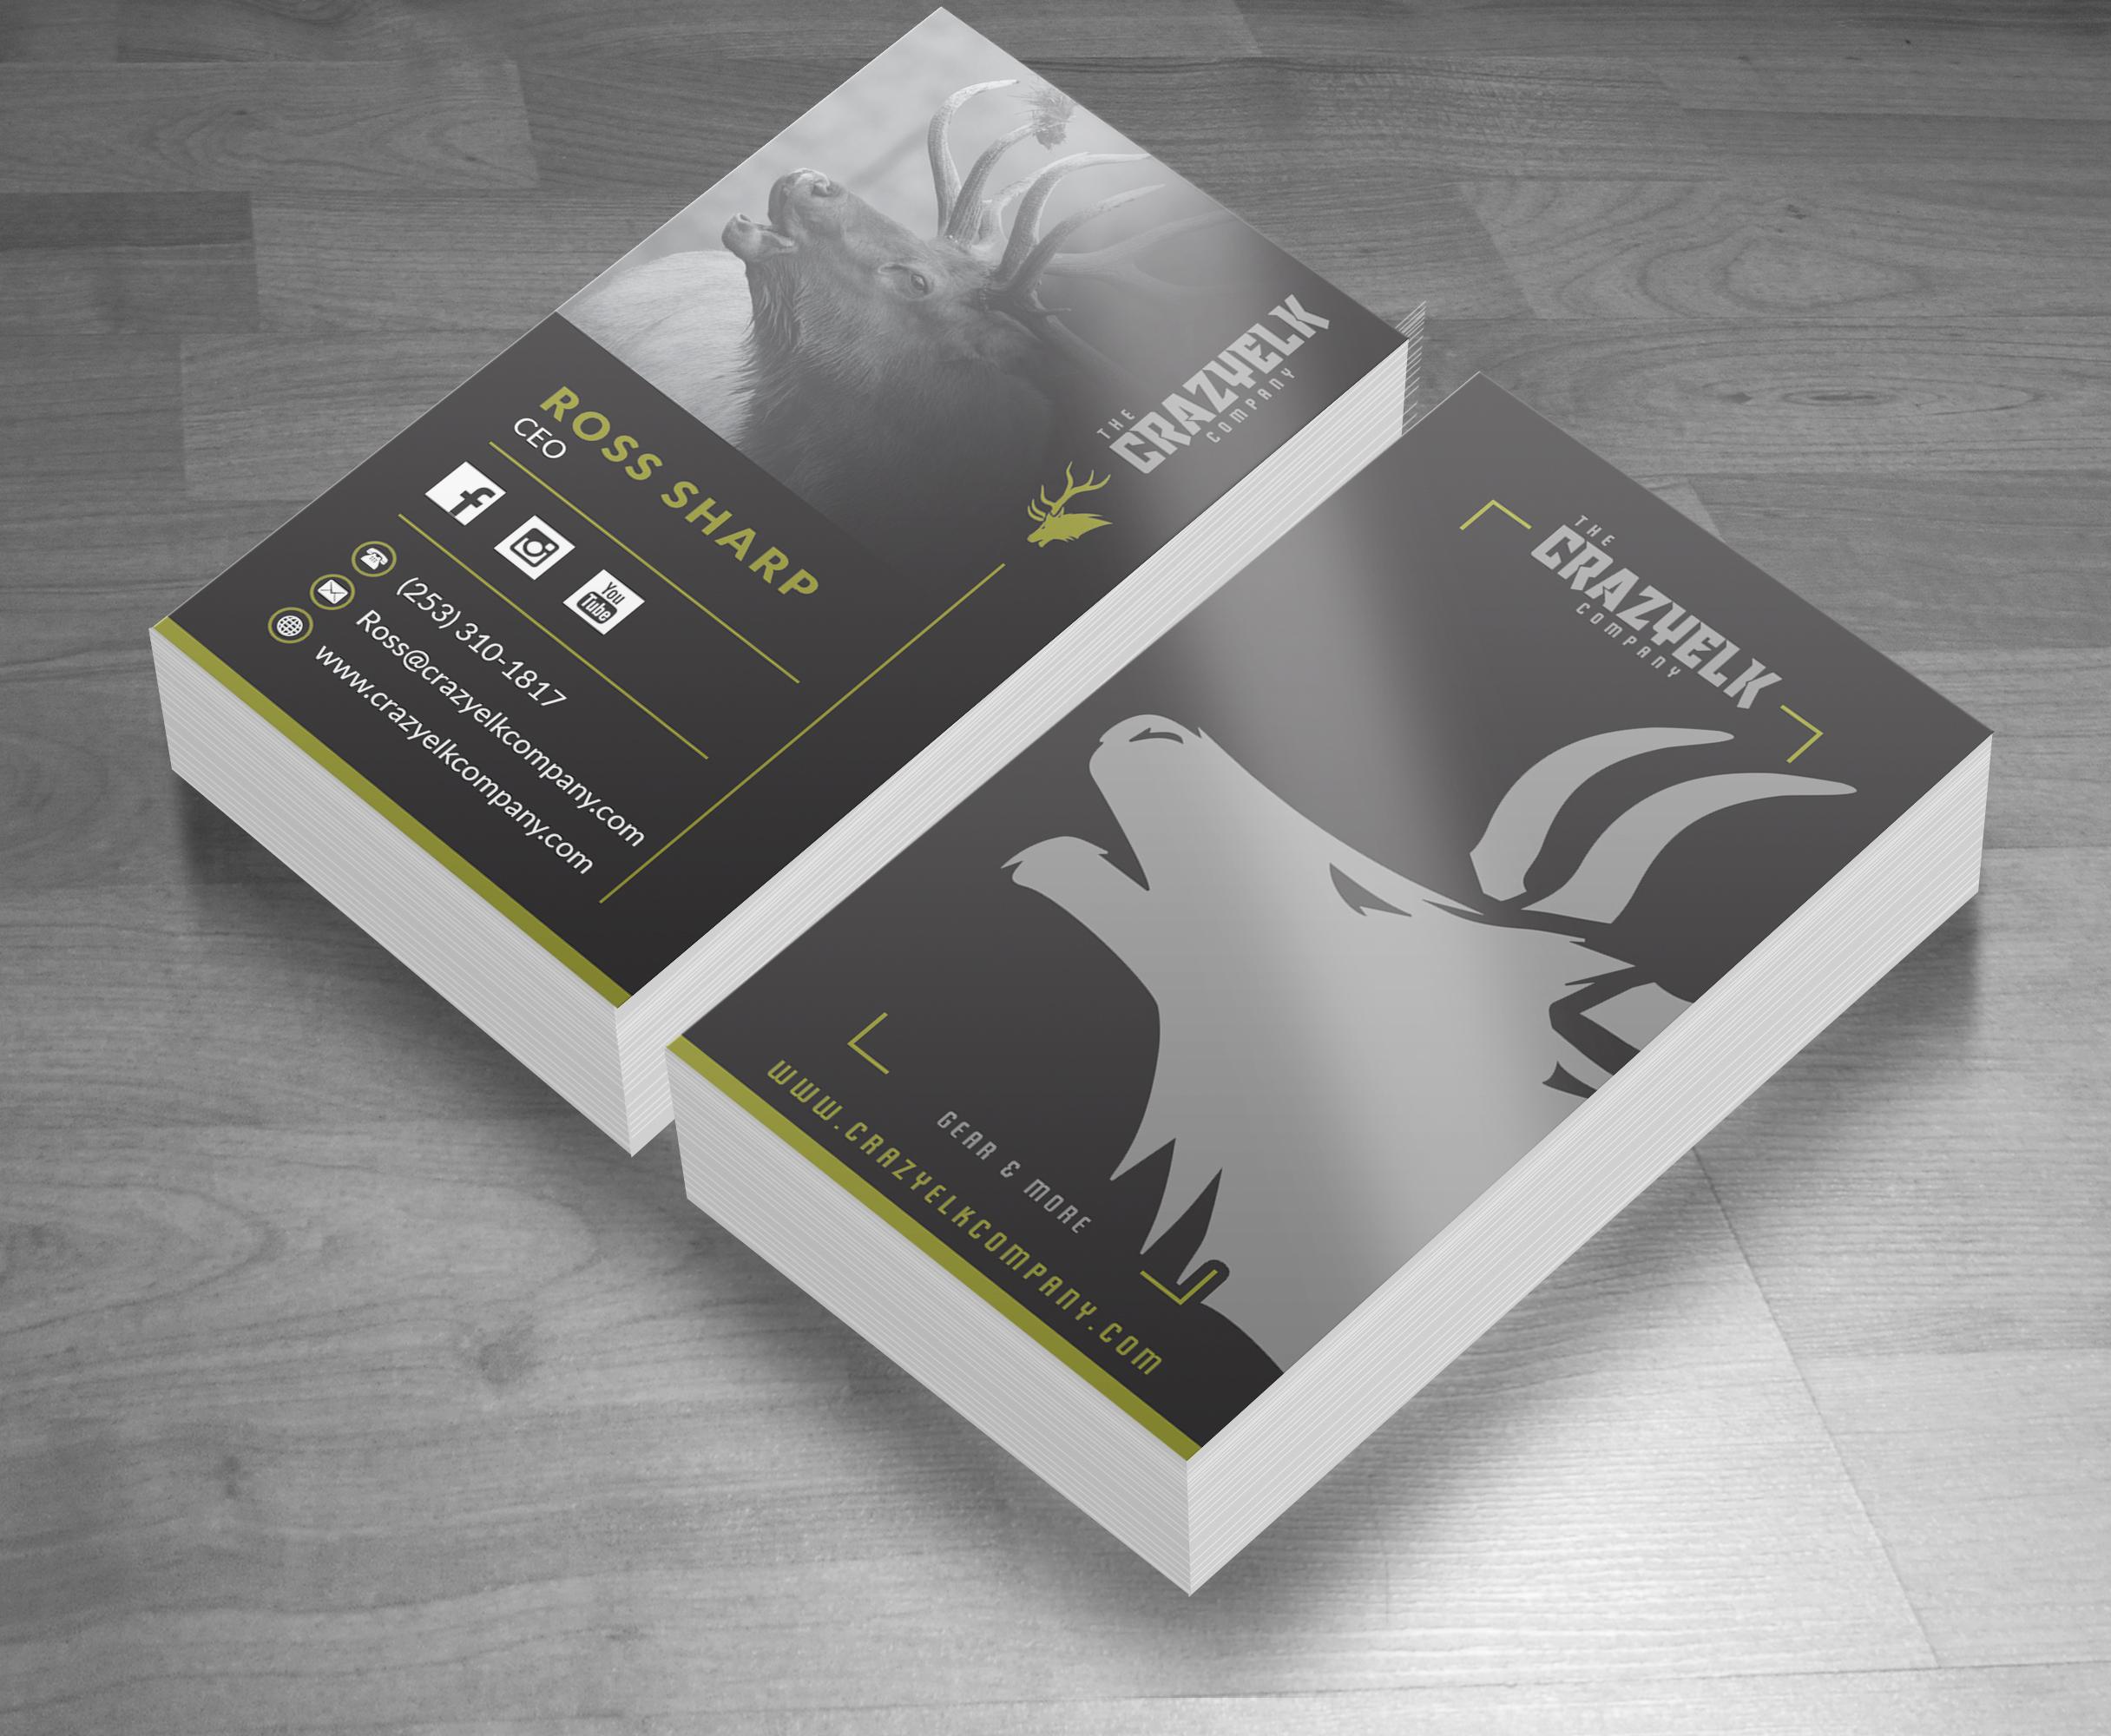 Crazy Elk Outdoor Apparel Brand Business Card Design